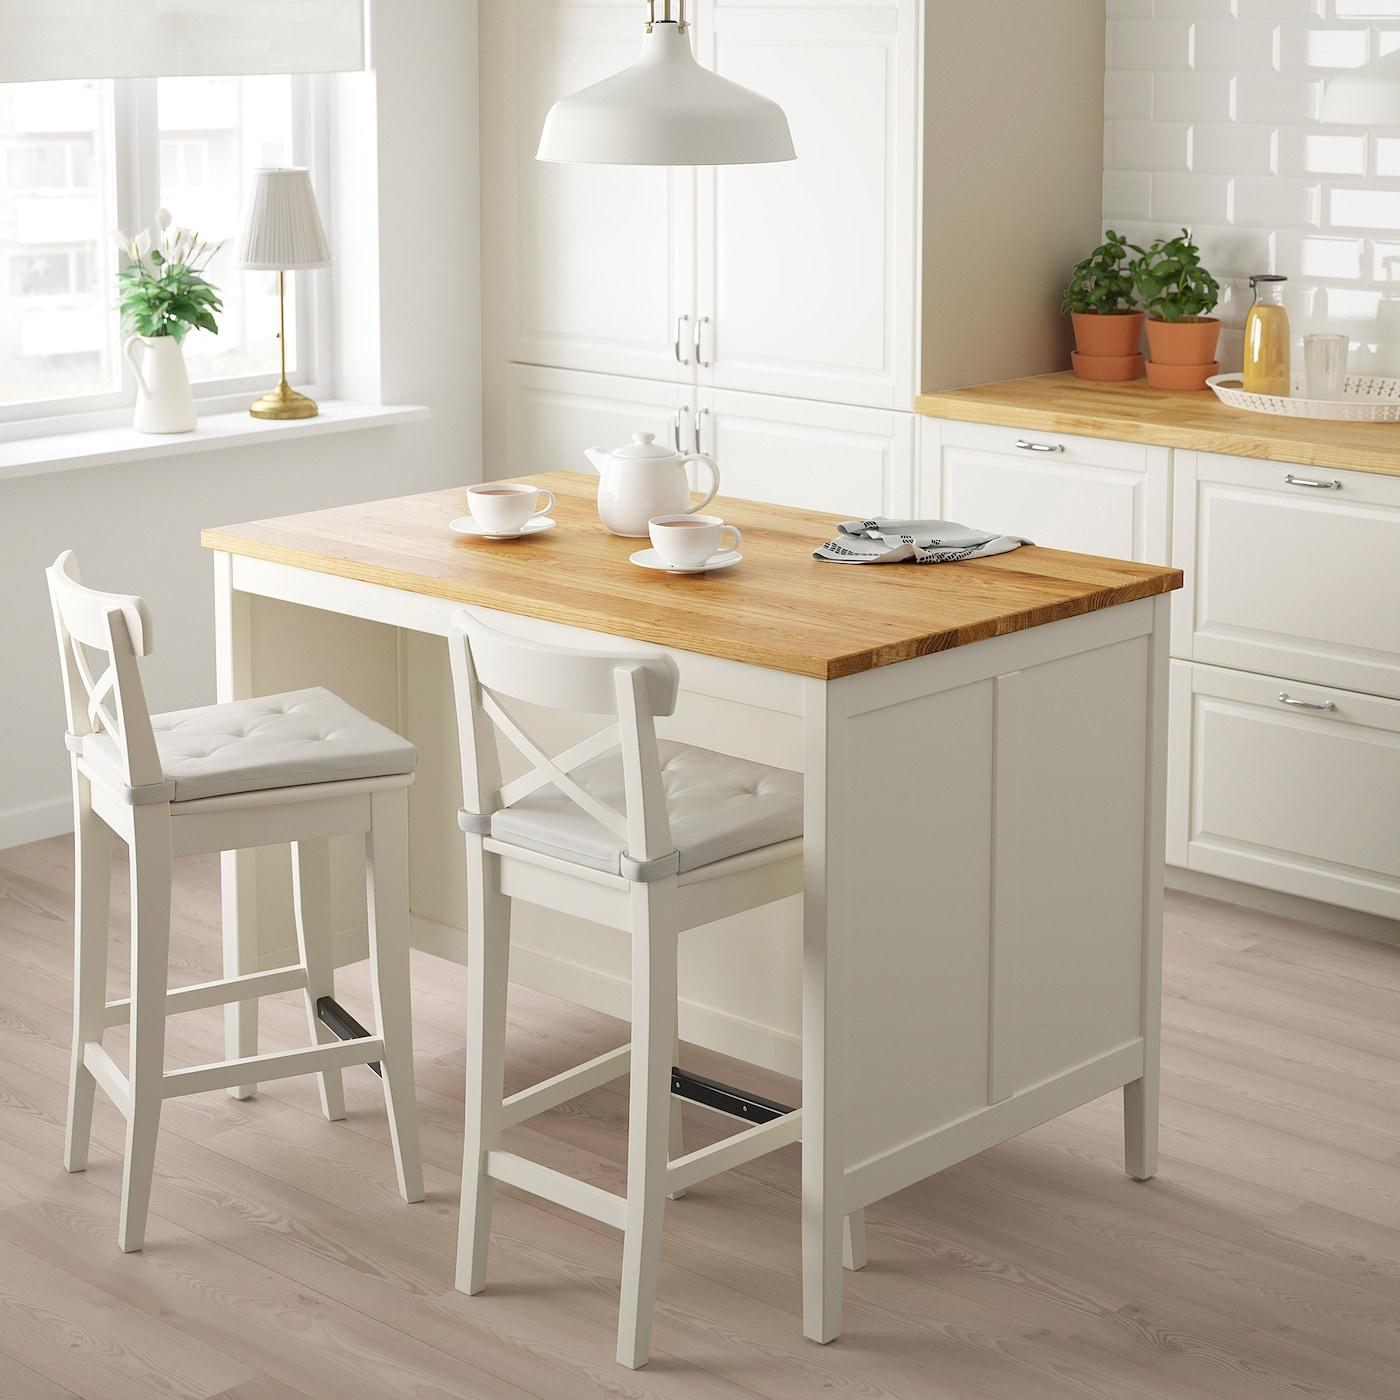 Tornviken Kitchen Island Off White Oak 49 5 8x30 3 8 Our Favorite Ikea